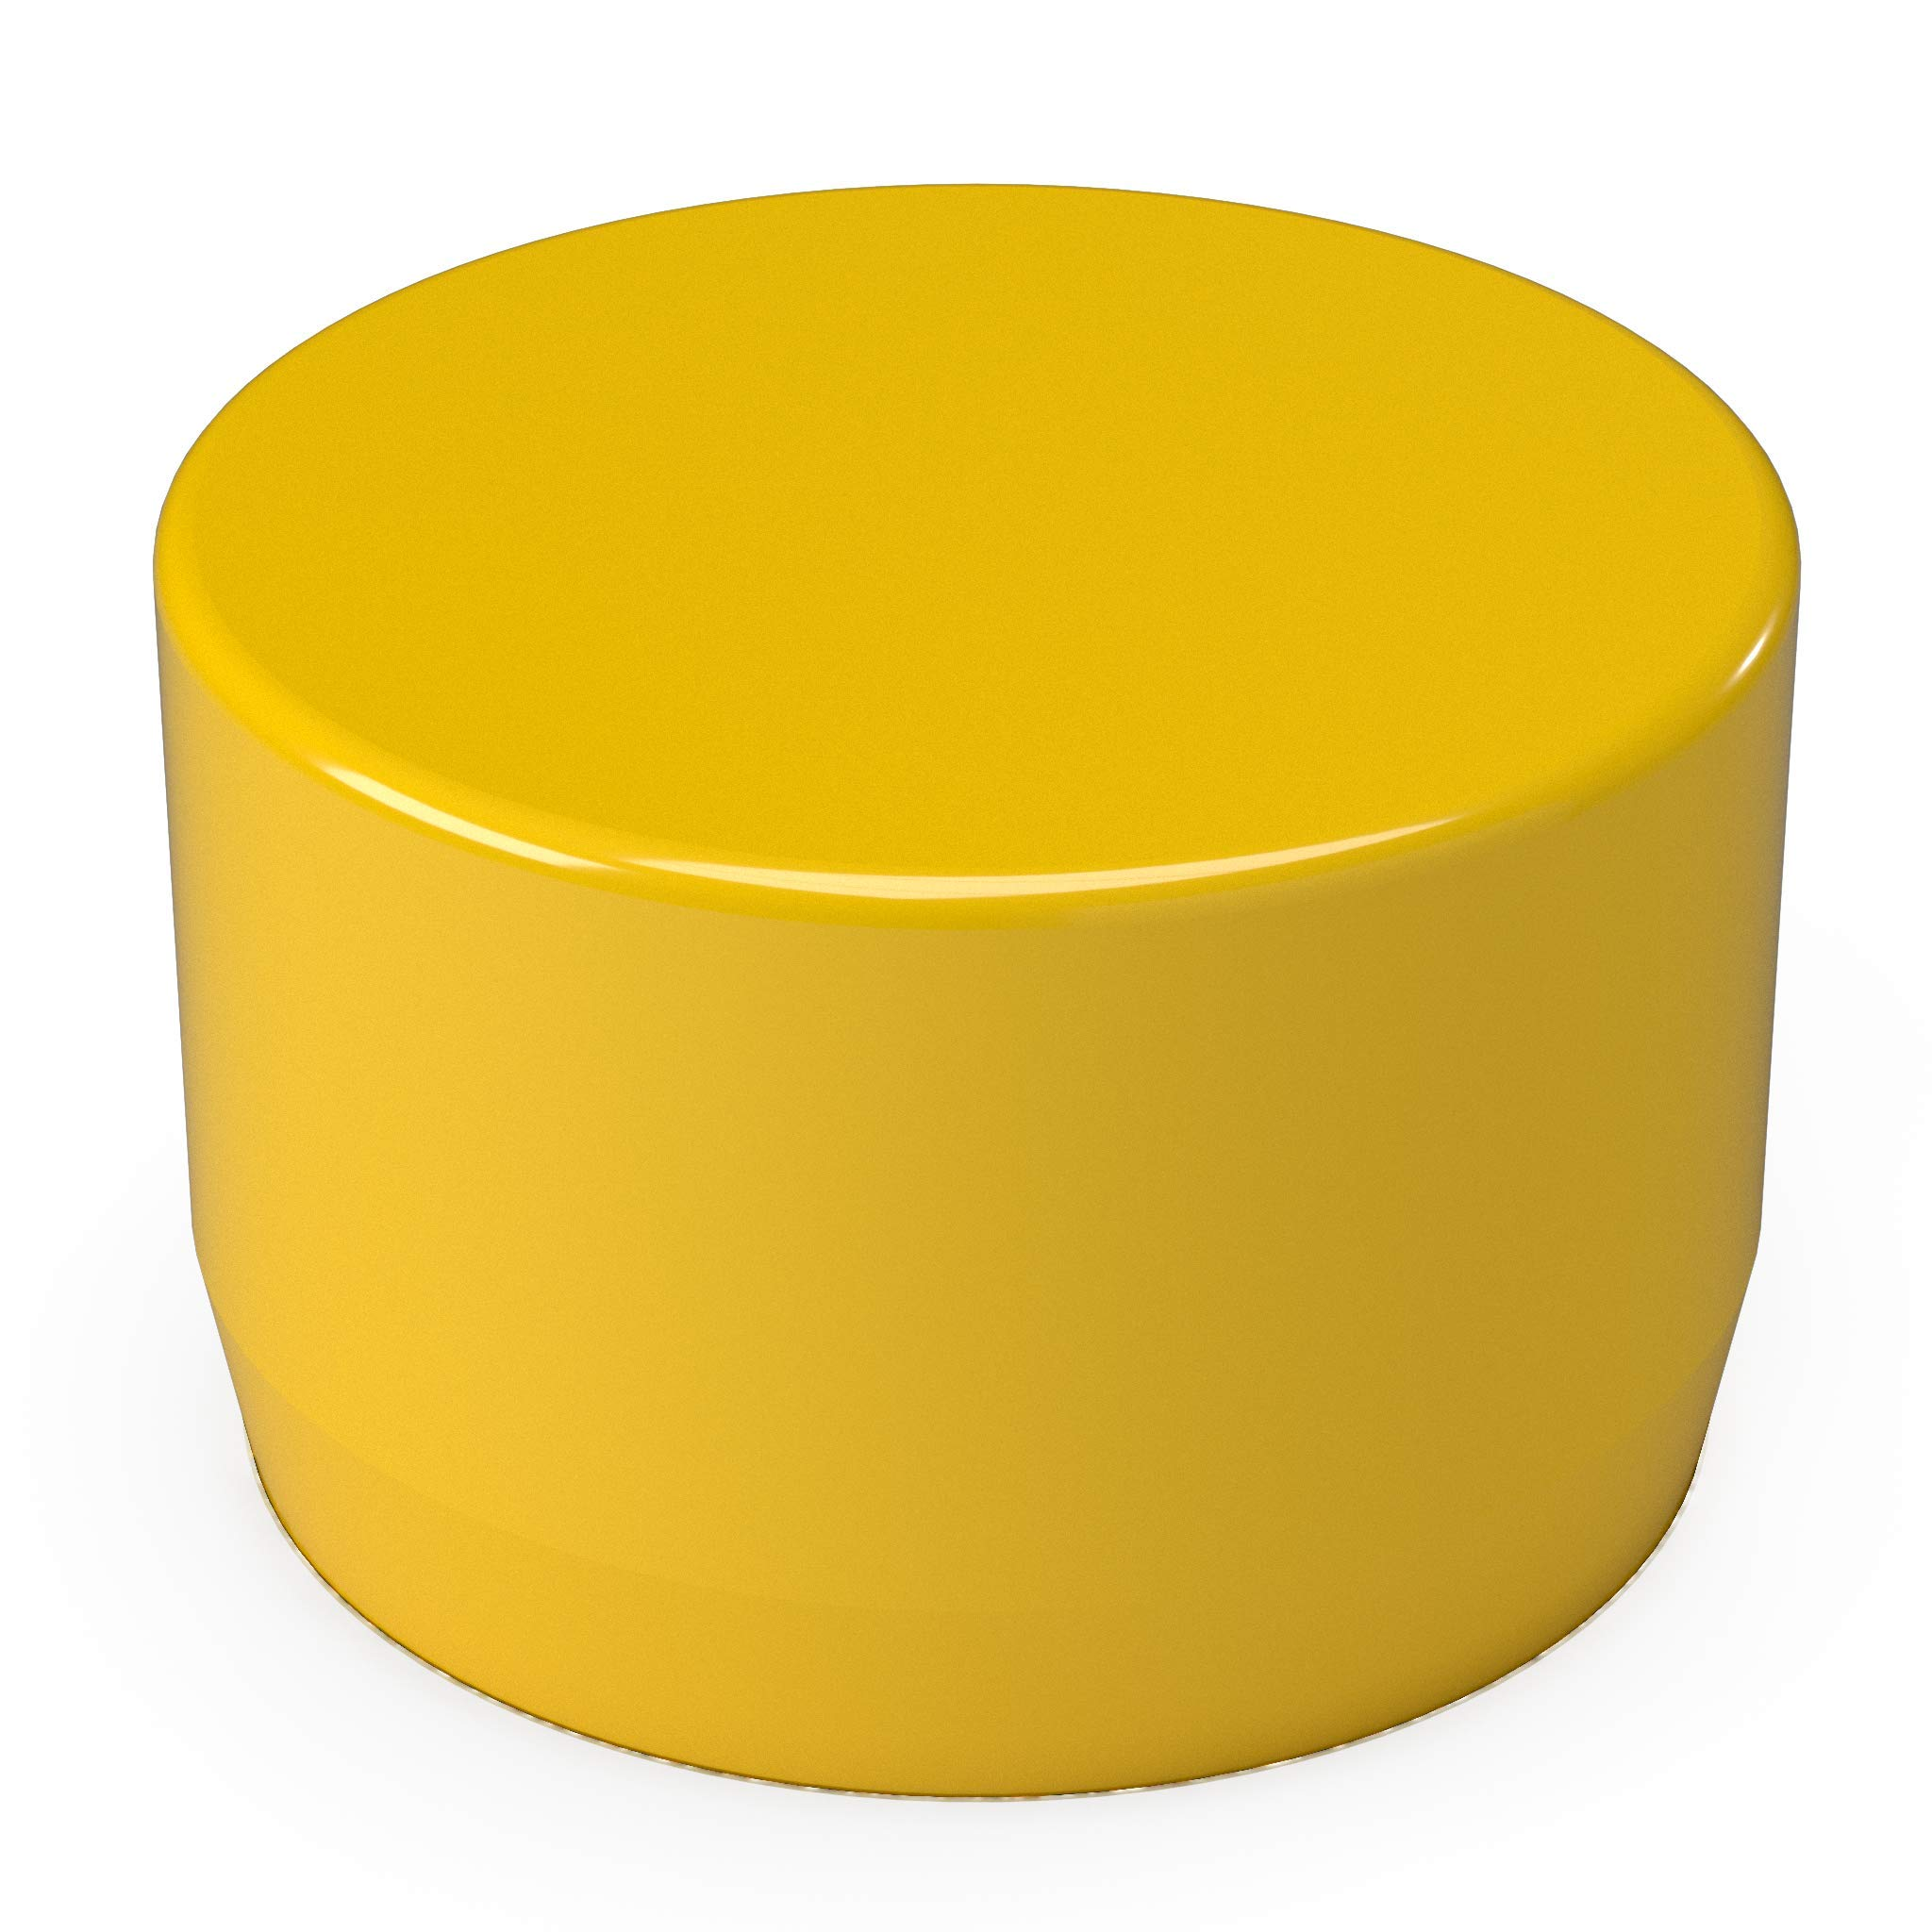 FORMUFIT F114EEC-YE-10 PVC External End Cap, Furniture Grade, 1-1/4'' Size, Yellow (Pack of 10)